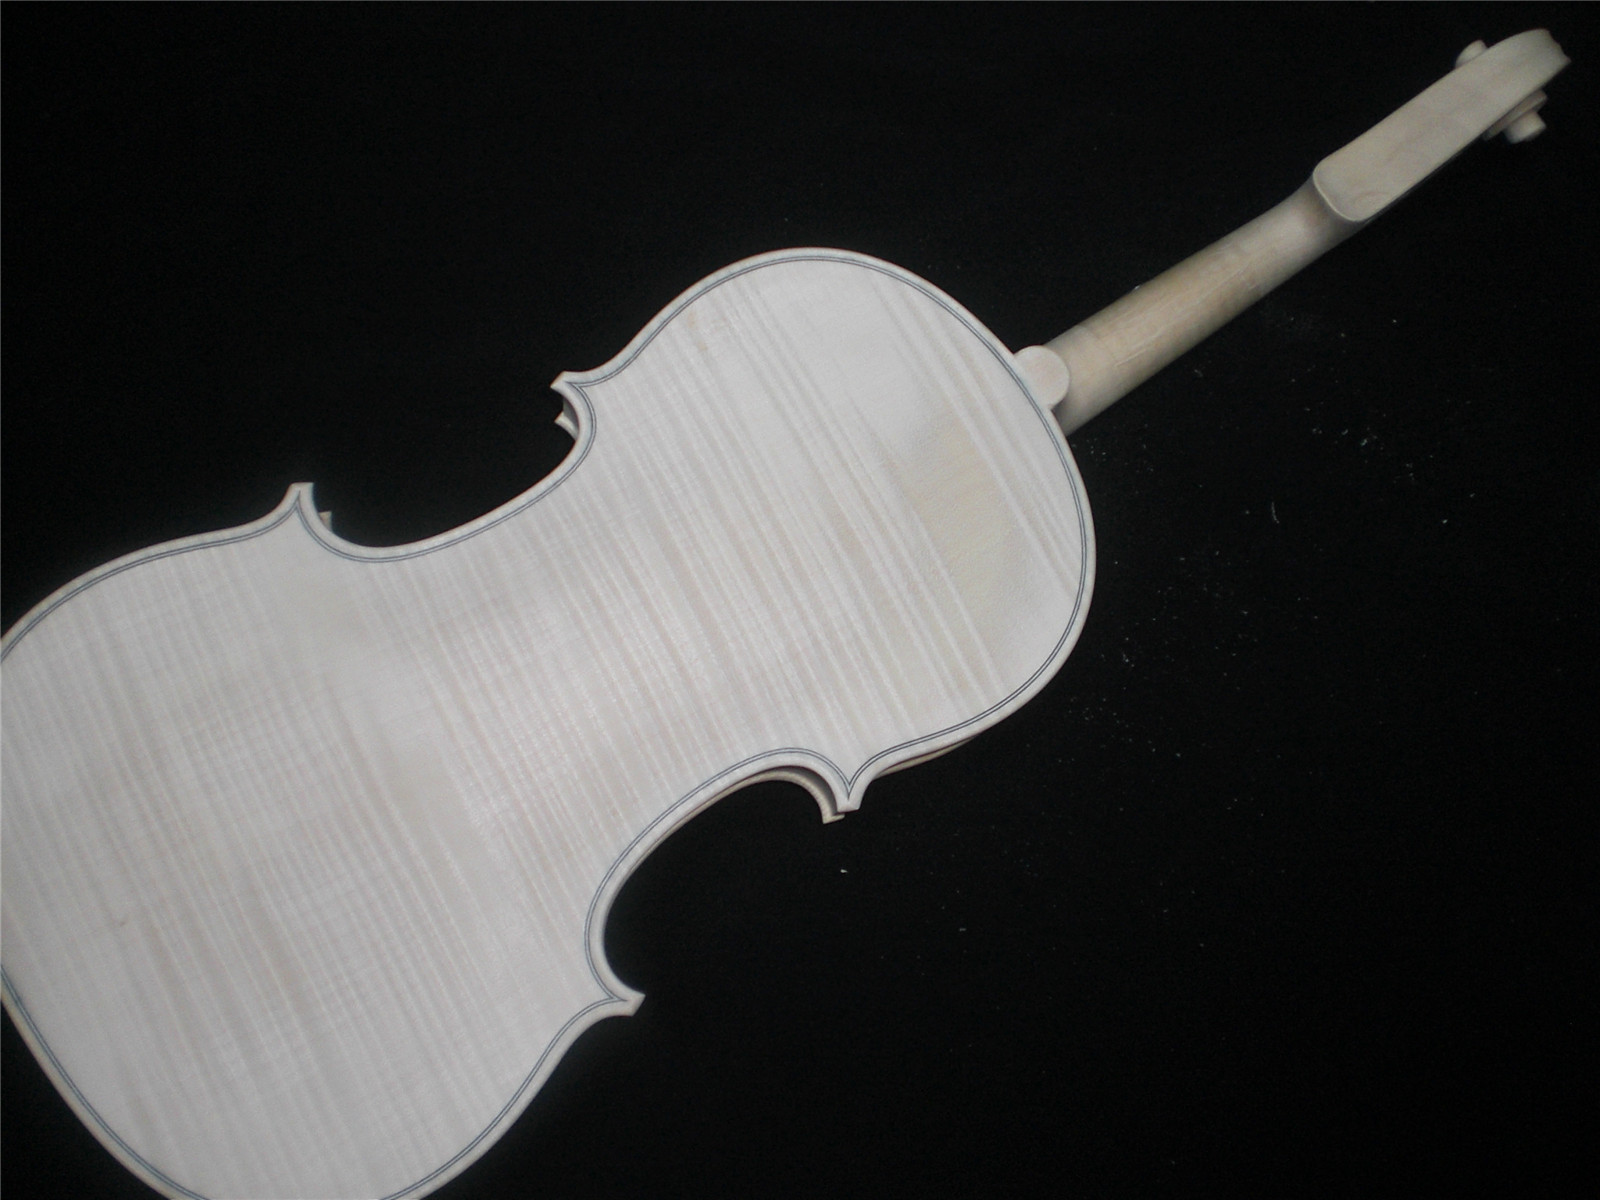 1 PC Flamed Maple Whole piece back Spruce top White Violin 4/4 unfinished violin nice wood grains EU5304# austrian spruce ch j b collion mezin copy french master violin no 1408 nice sound antique violin100% handmade